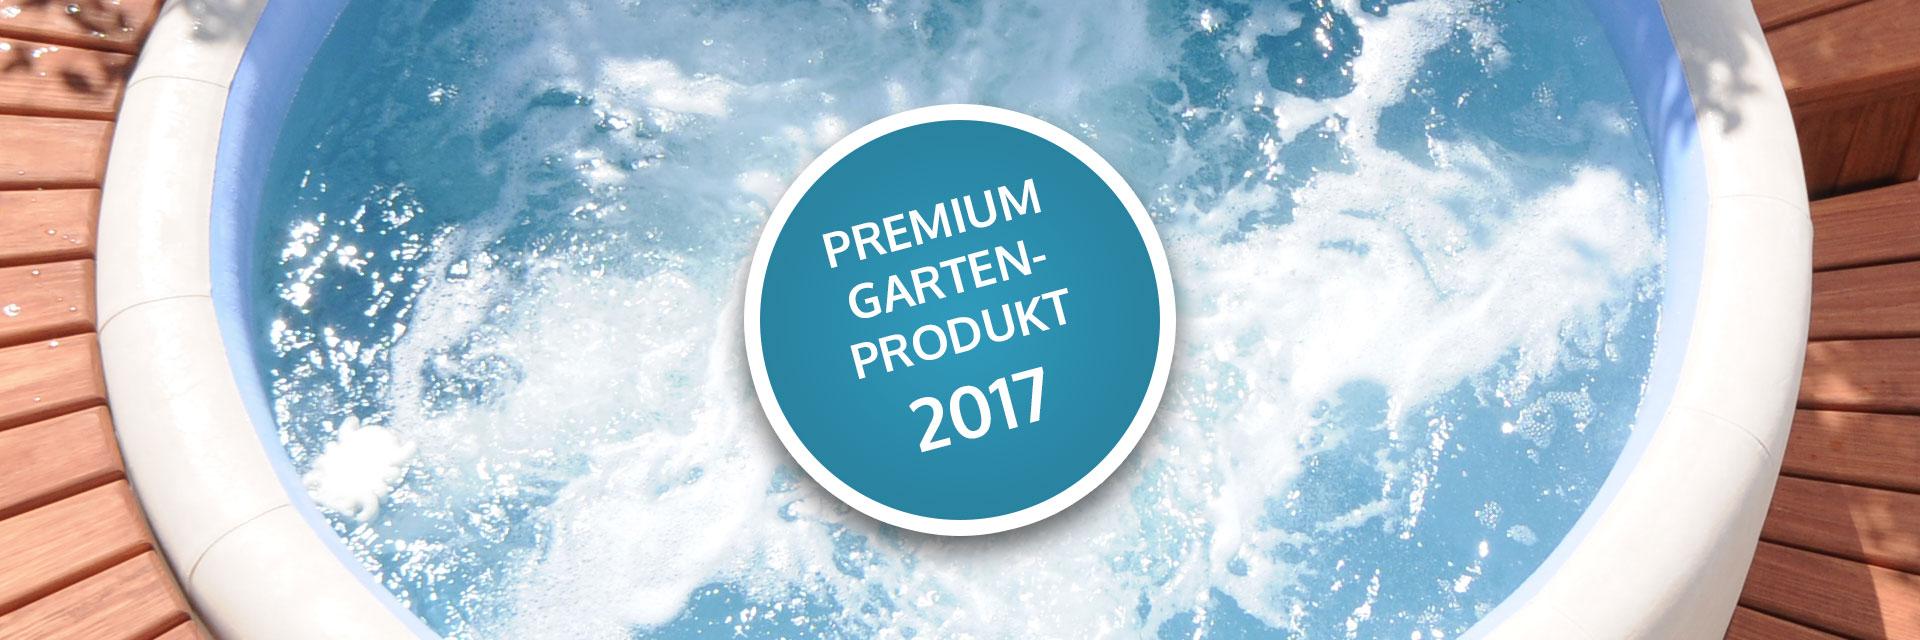 softub-whirlpool-premiumprodukt-aquasaar